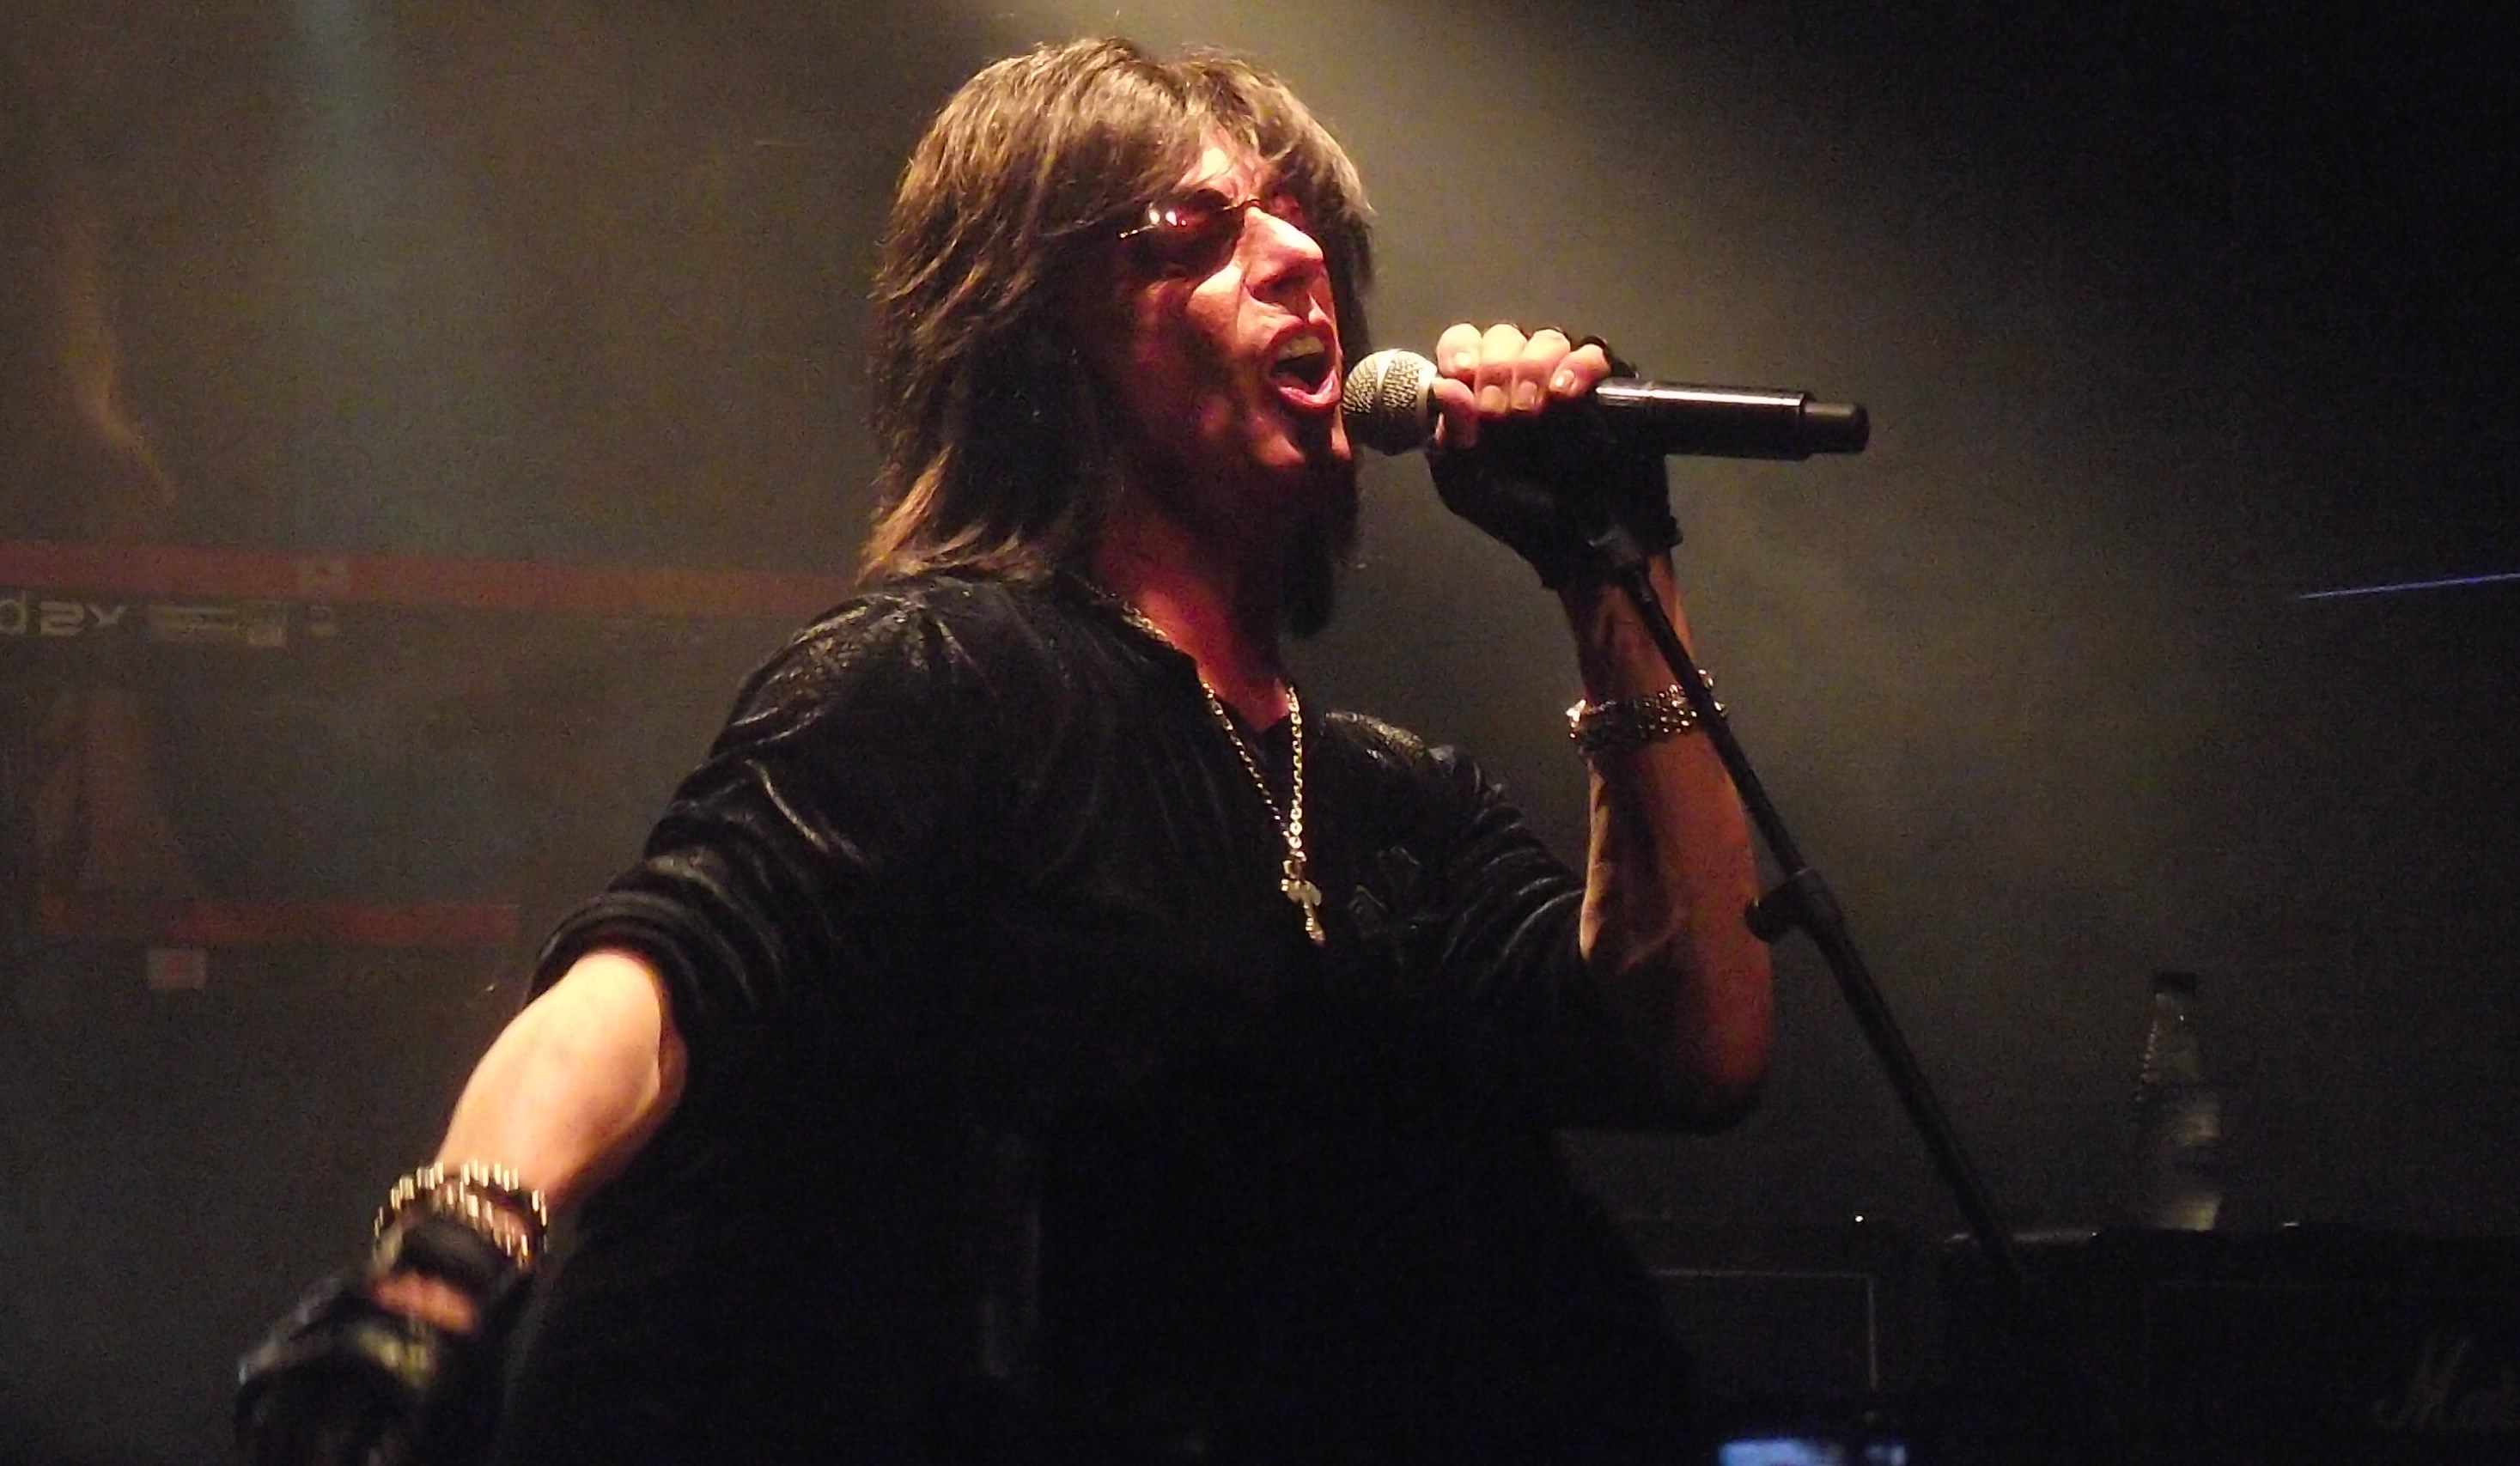 Crónica concierto Joe Lynn Turner (26-03-2015 Razzmatazz 2 – Barcelona)